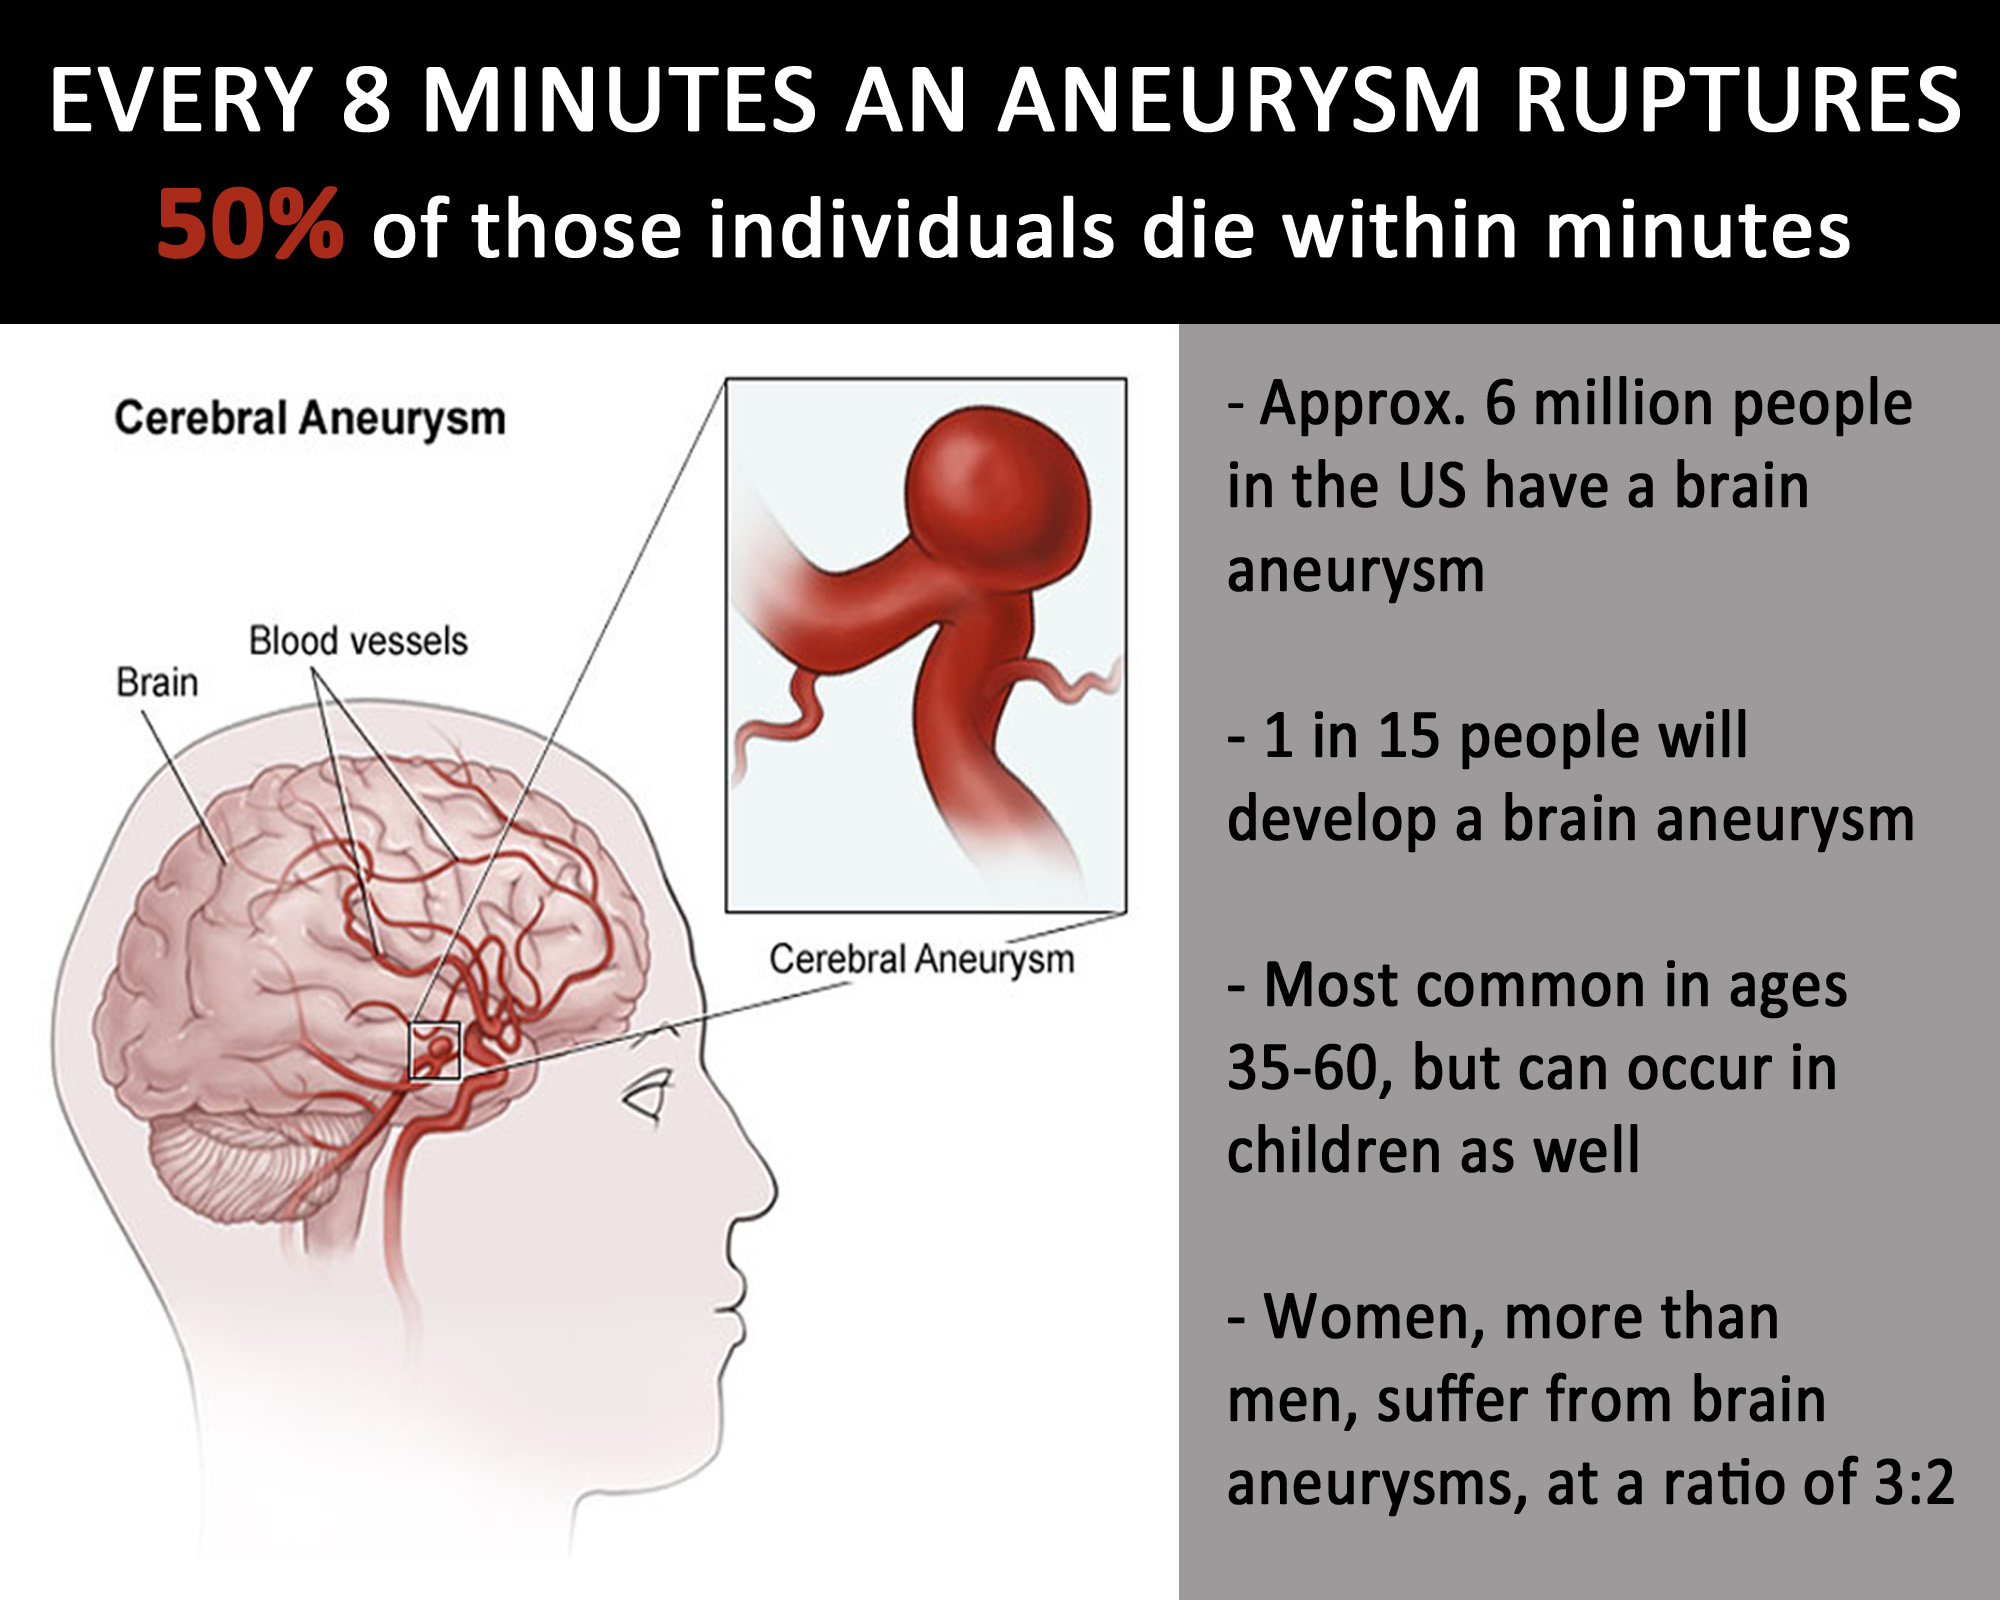 https://www.joeniekrofoundation.com/aneurysms/honoring-brain-aneurysm-awareness-week-march-12-18th/attachment/az-midday-chart-copy/